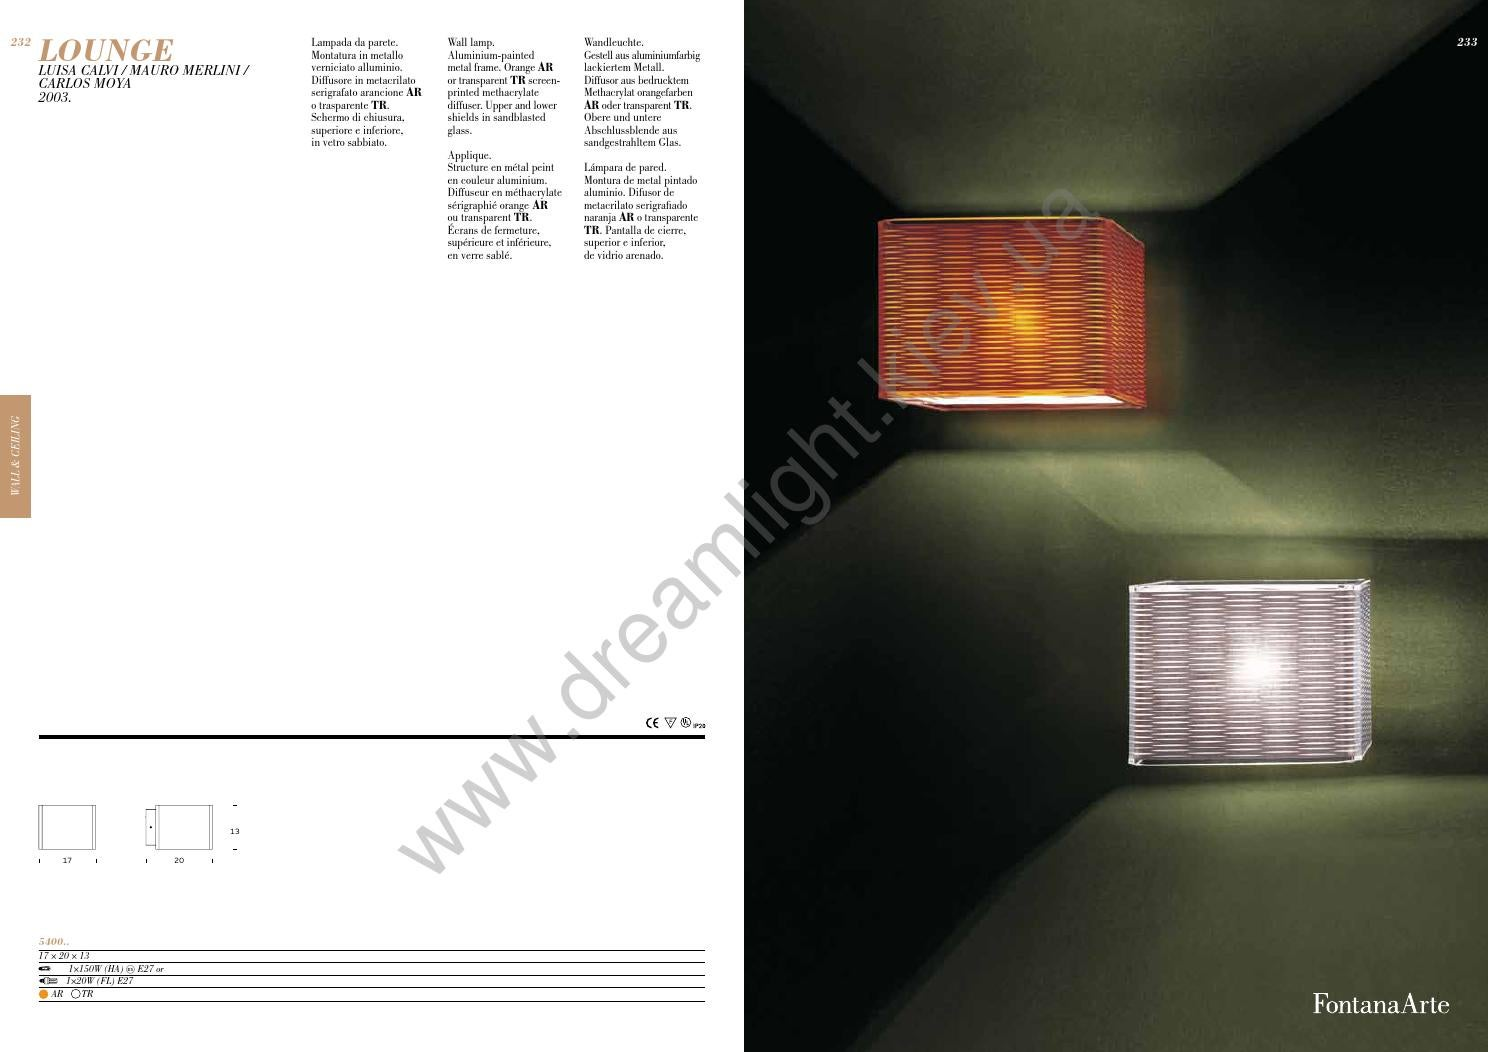 Fontana arte catalogo master 2012 by www.dreamlight.kiev.ua issuu